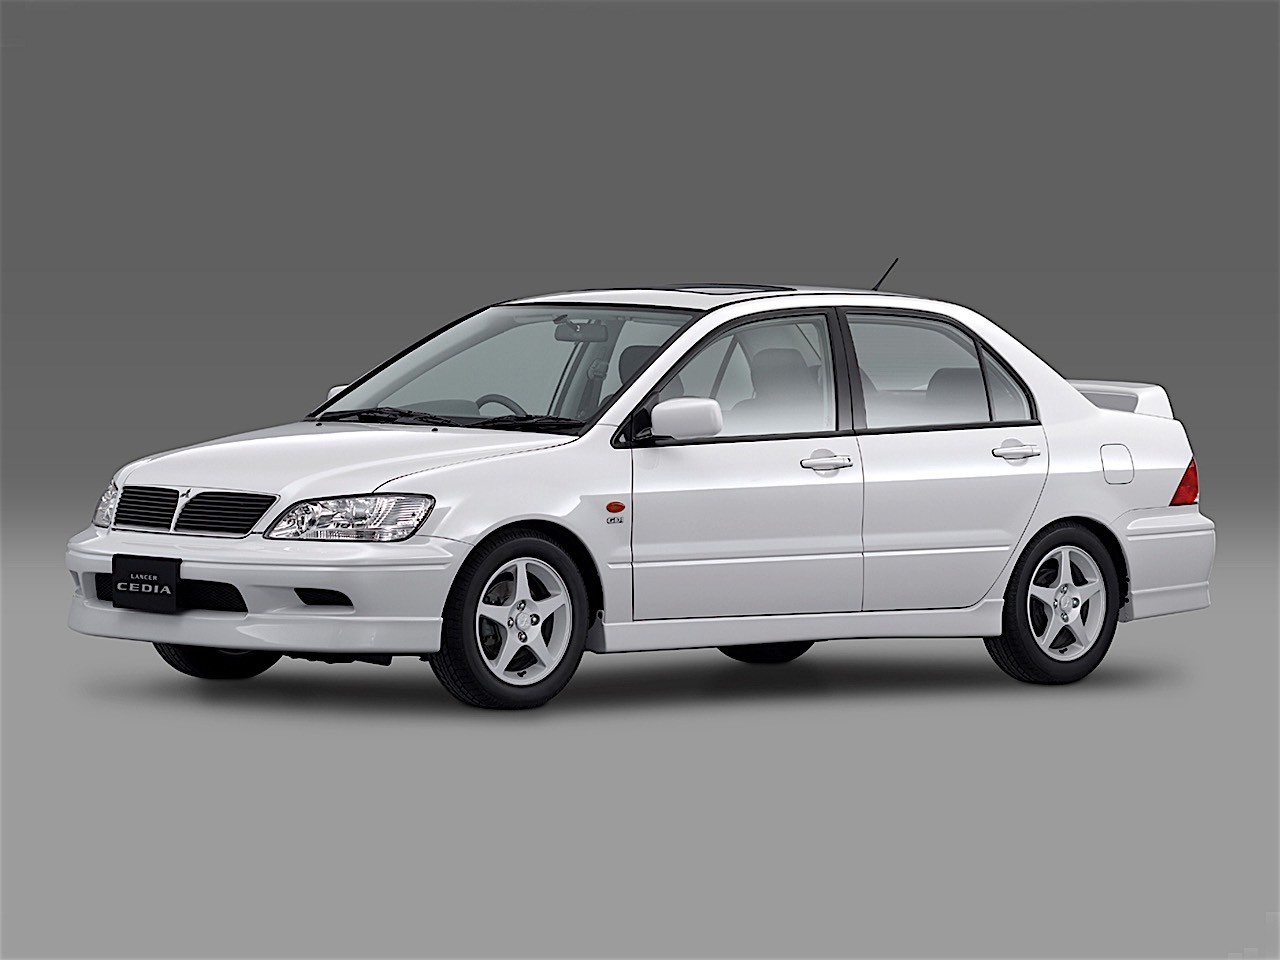 lancer mitsubishi 2000 2003 cedia 6th sedan generation cars spec autoevolution 2001 cvt 2002 specs dog